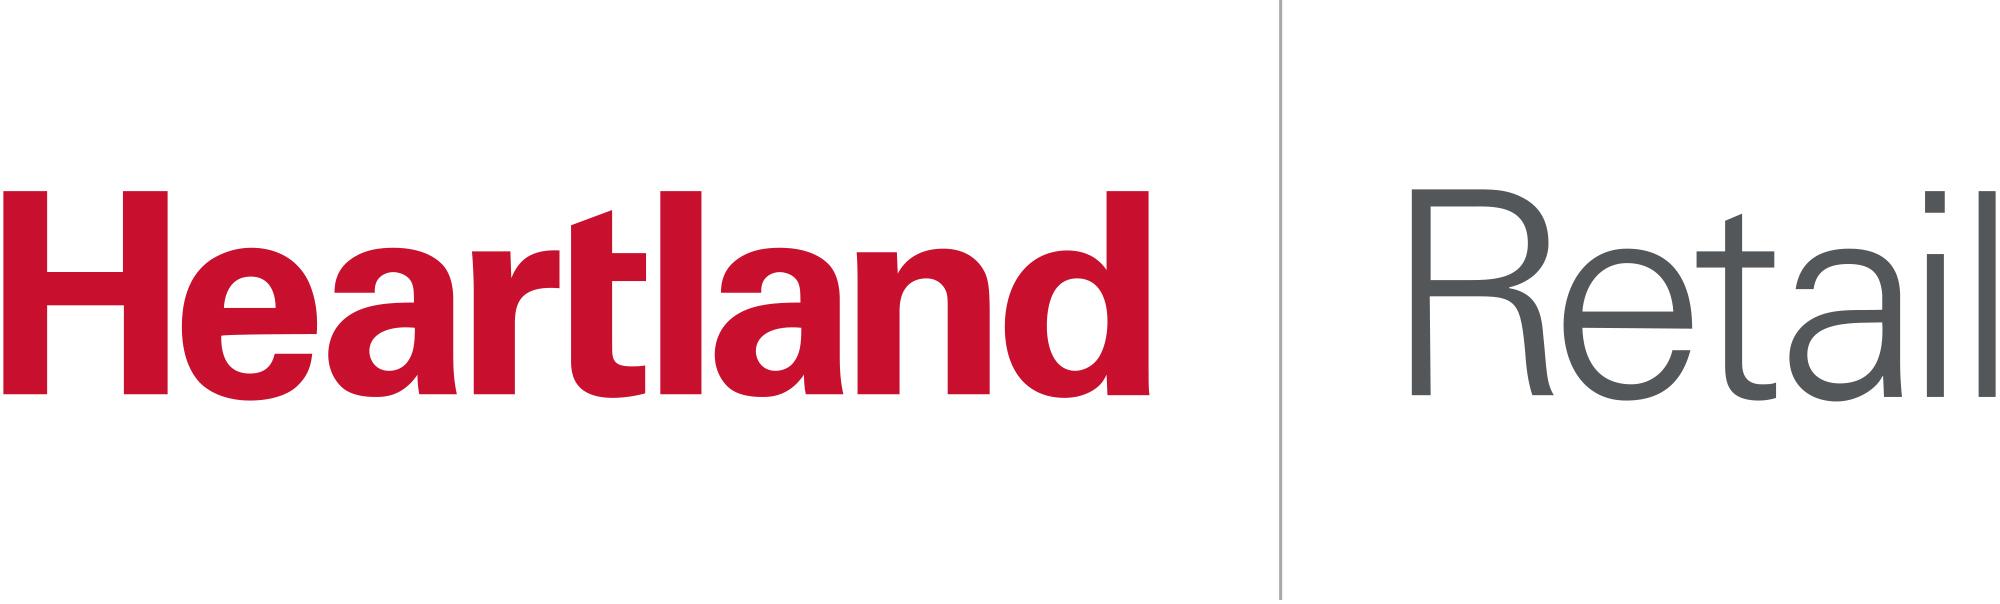 Heartland Retail POS